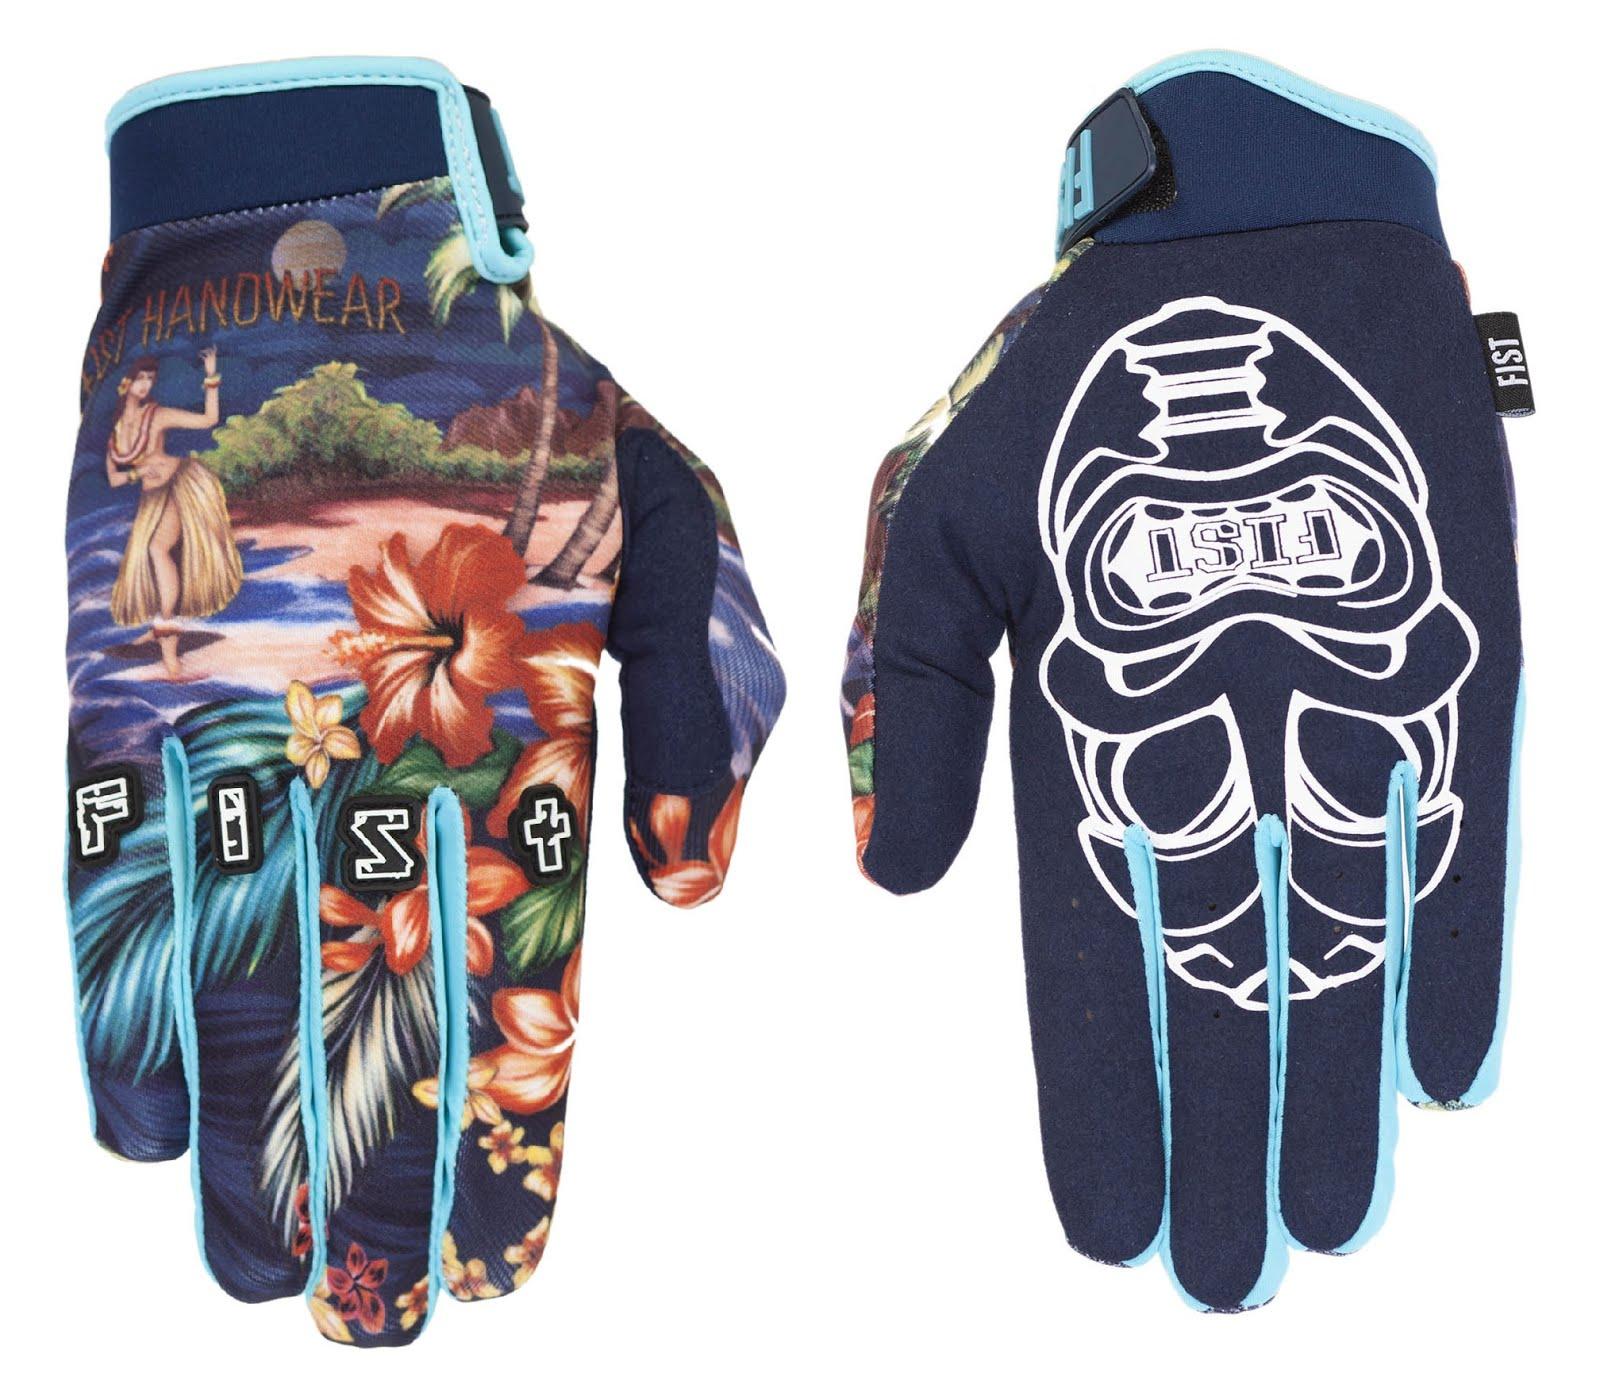 Guantes FIST handwear ---- Adulto $80.000 ---------- Niño $75.000 -----